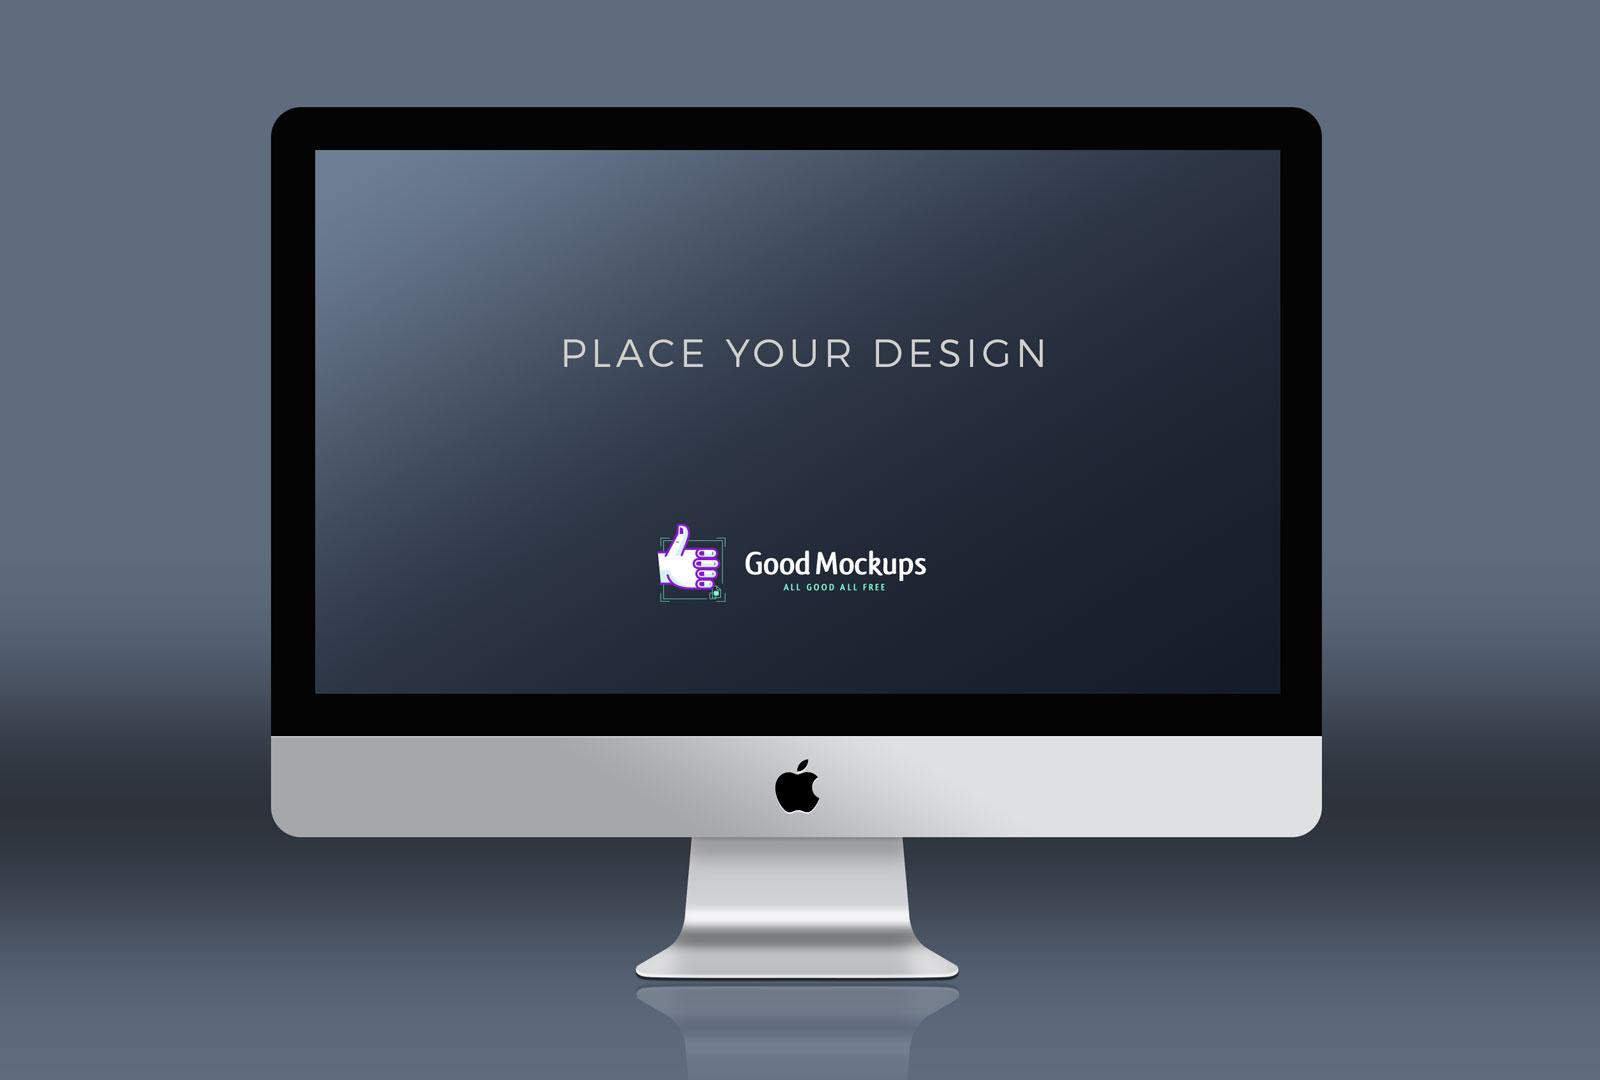 Free-Apple-iMac-Mockup-PSD-Template